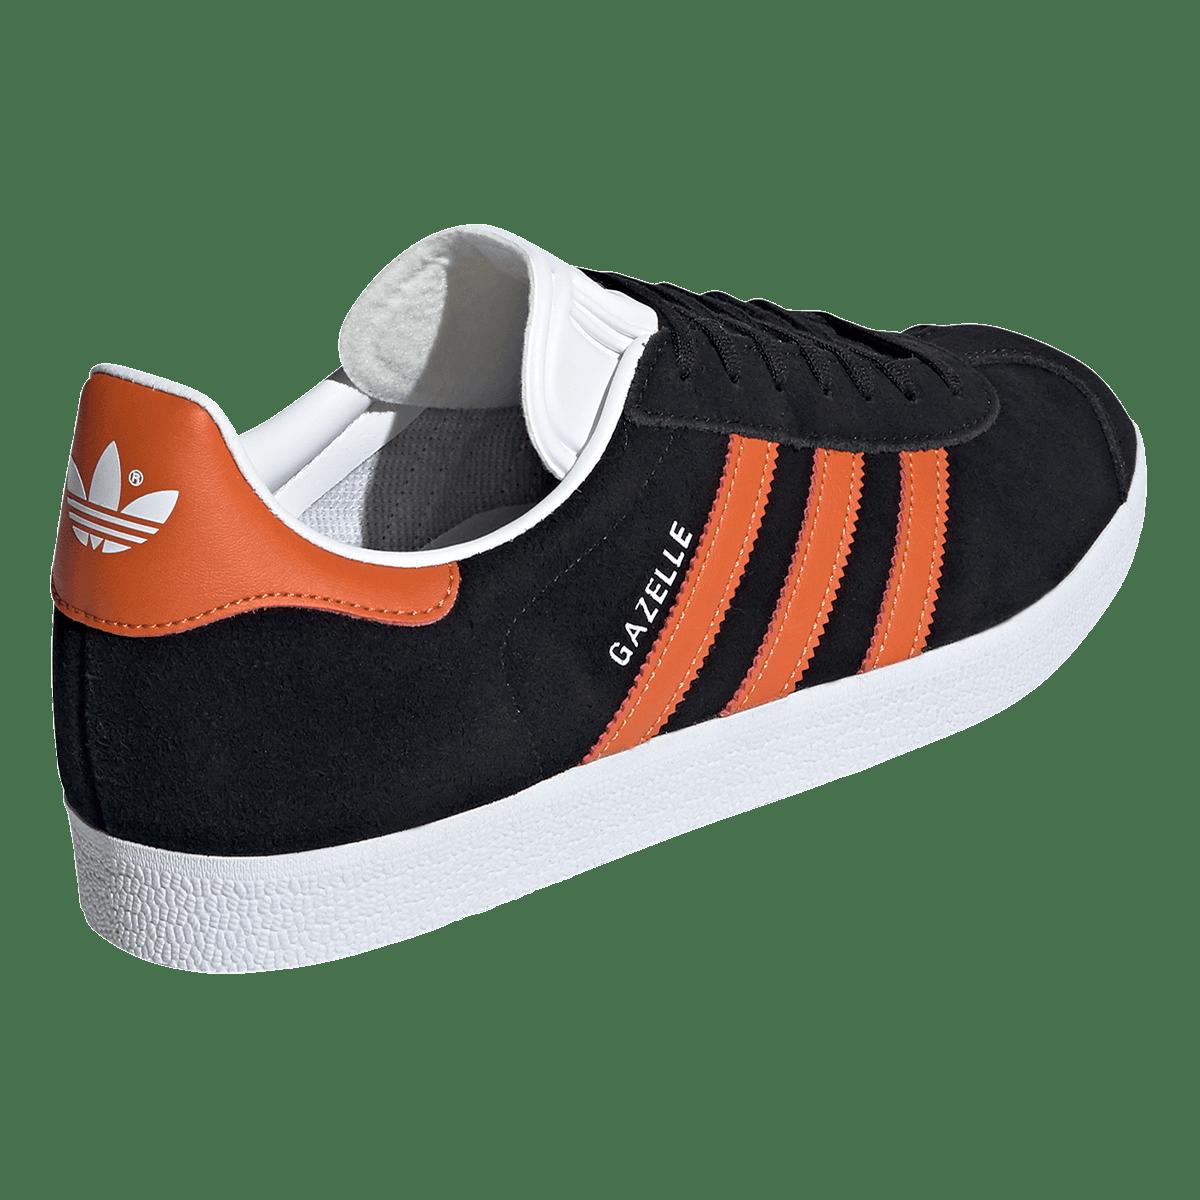 adidas Gazelle loisir chaussure noir / marron - Boutique football